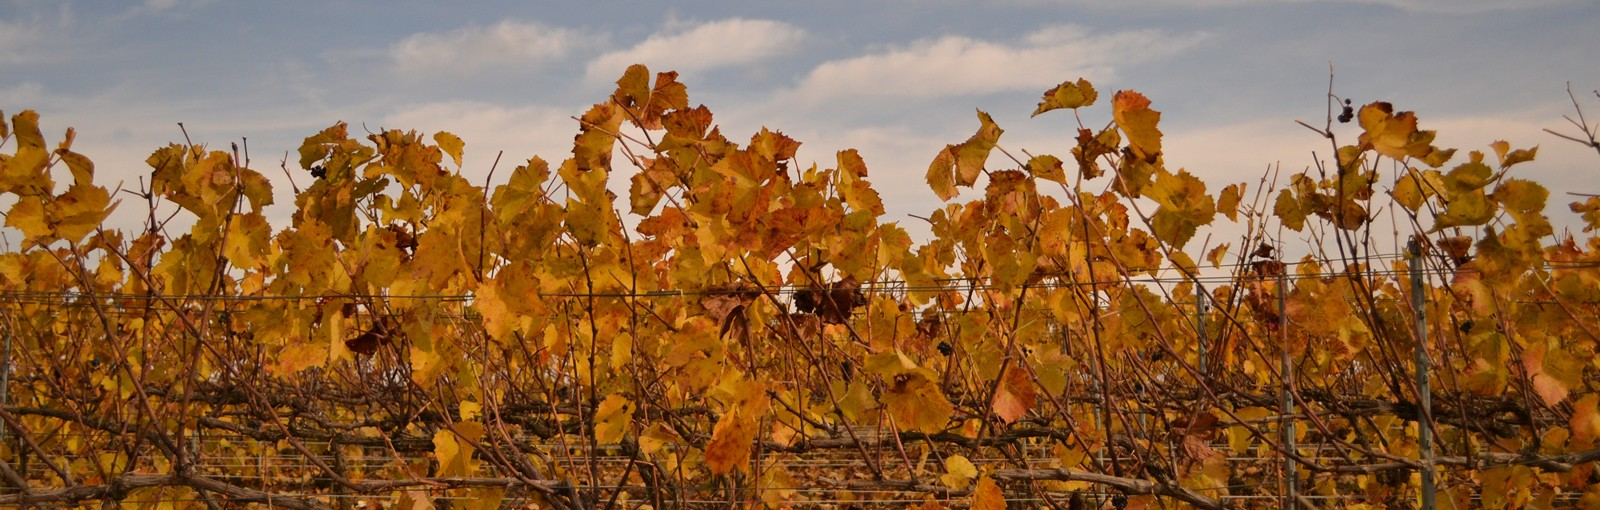 Tours Champagne - Burgundy - Berry - Multi-régional - Circuitos desde Paris